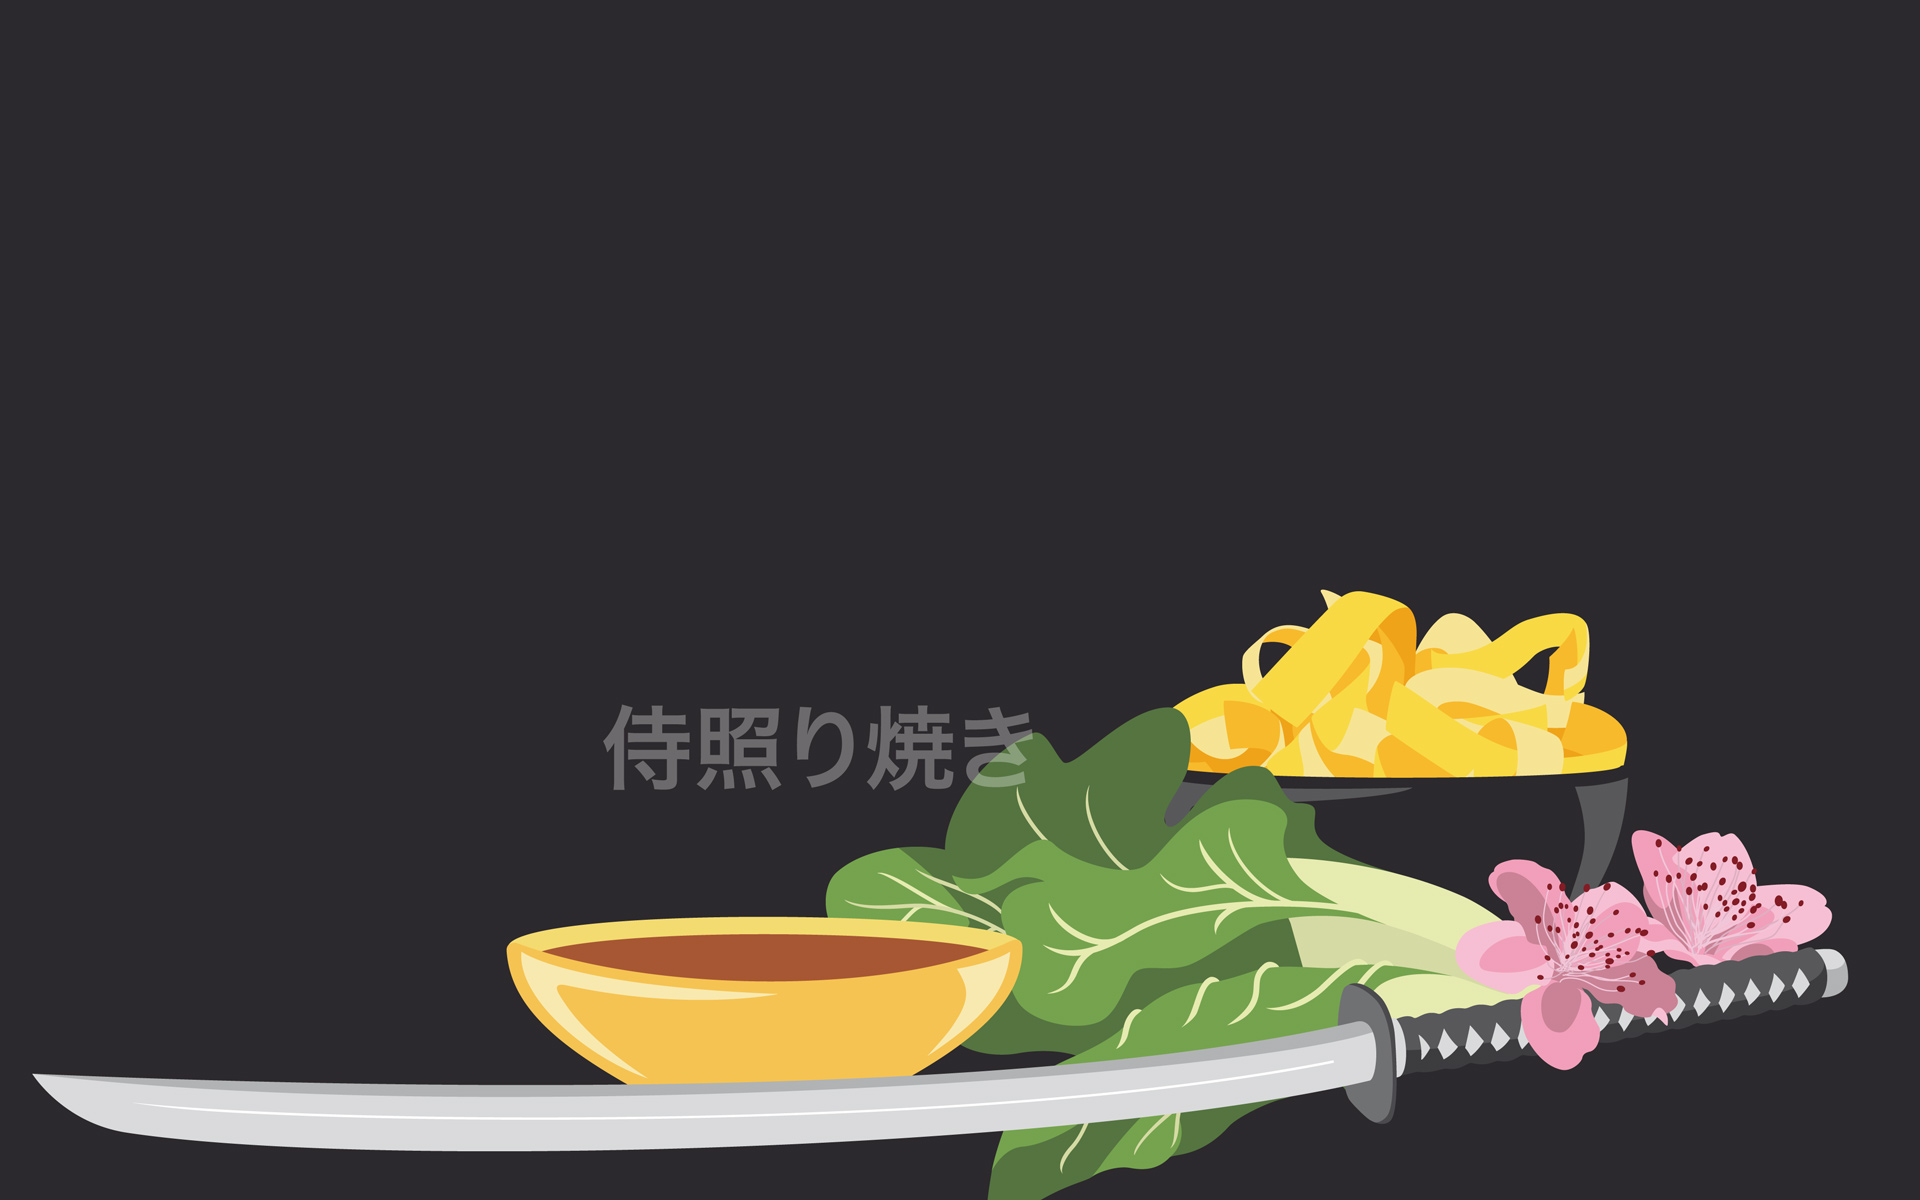 youcook Brand Identity, Illustration, Chicken Teryaki